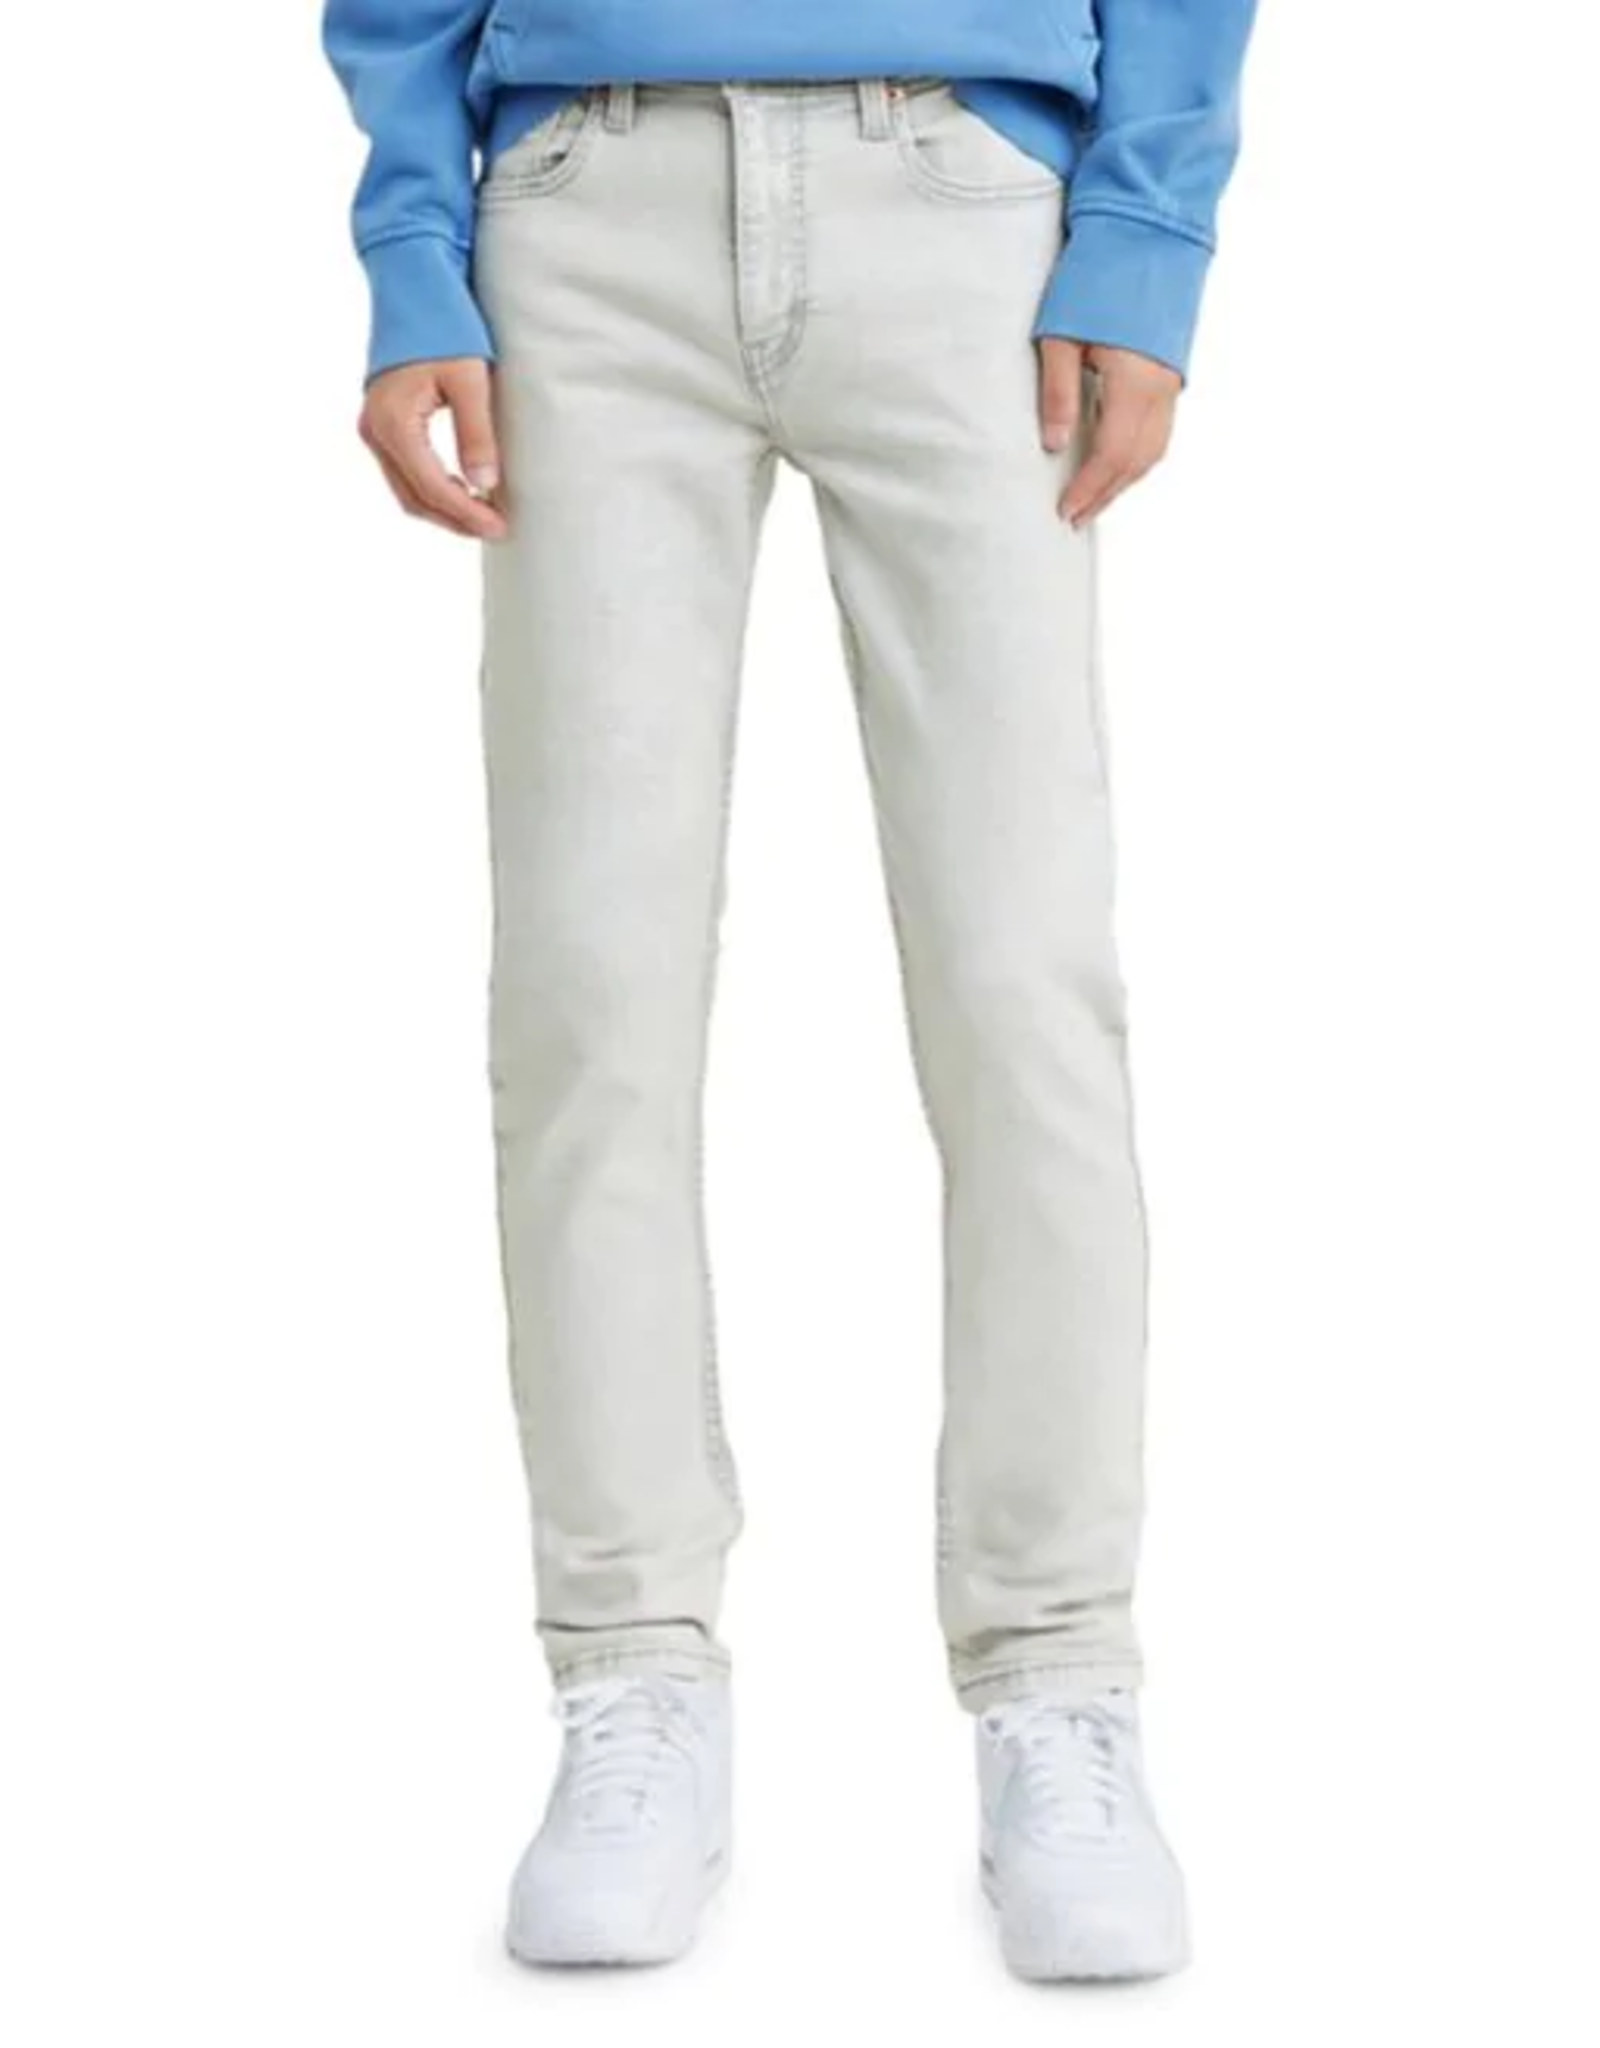 Levi's - jeans 512 slim taper fit flex cranberry crumble